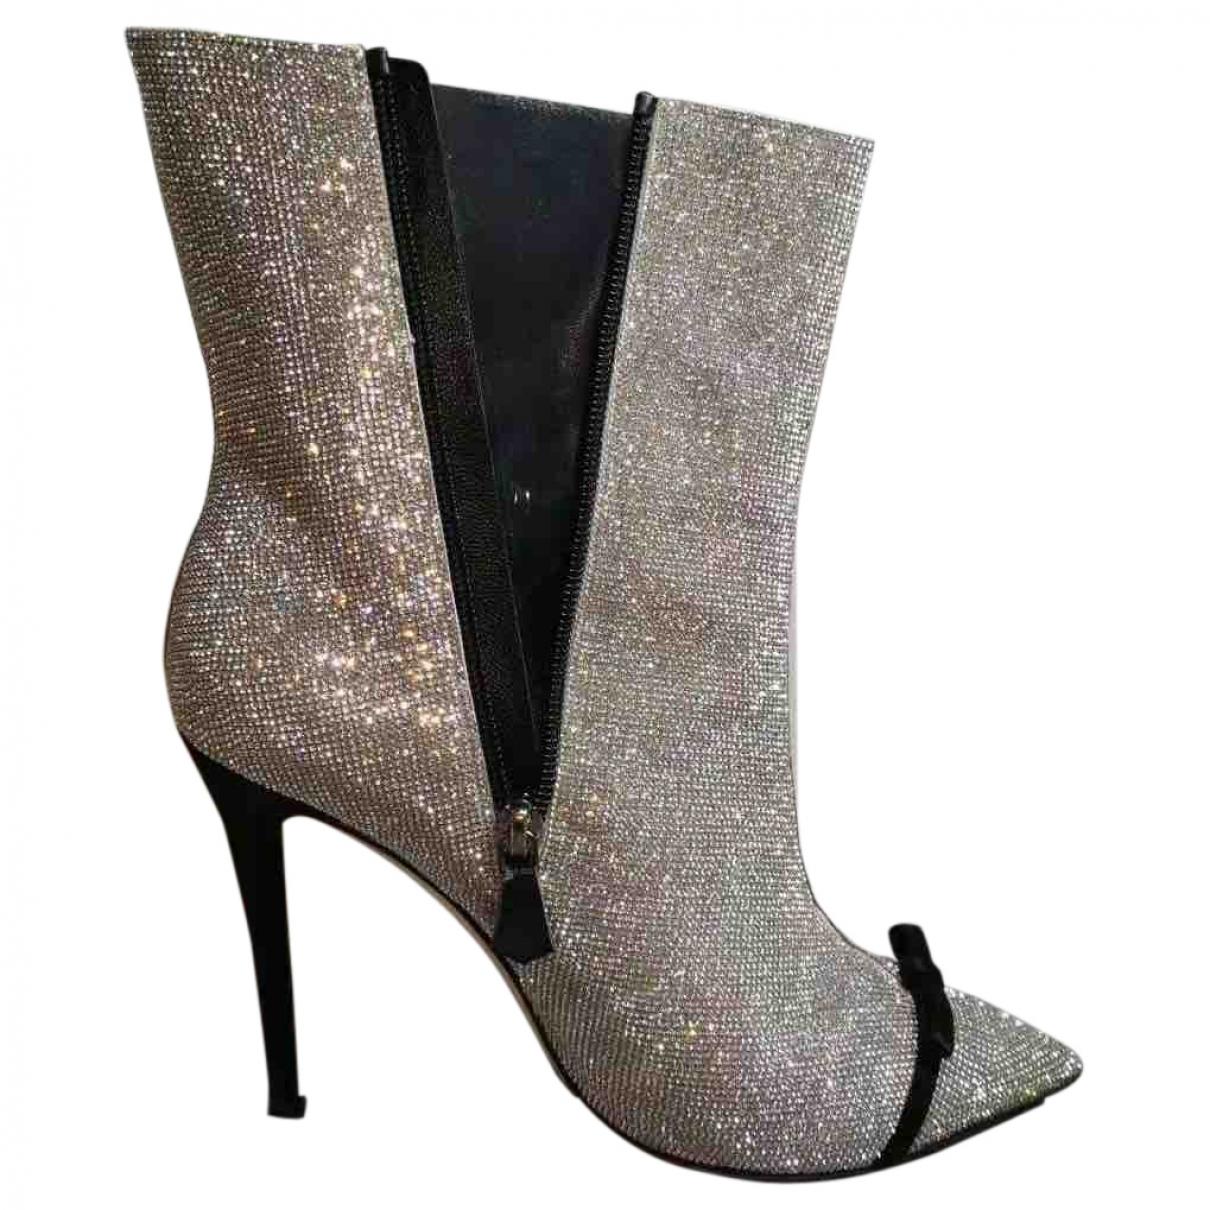 Marco De Vincenzo \N Metallic Leather Ankle boots for Women 40 EU